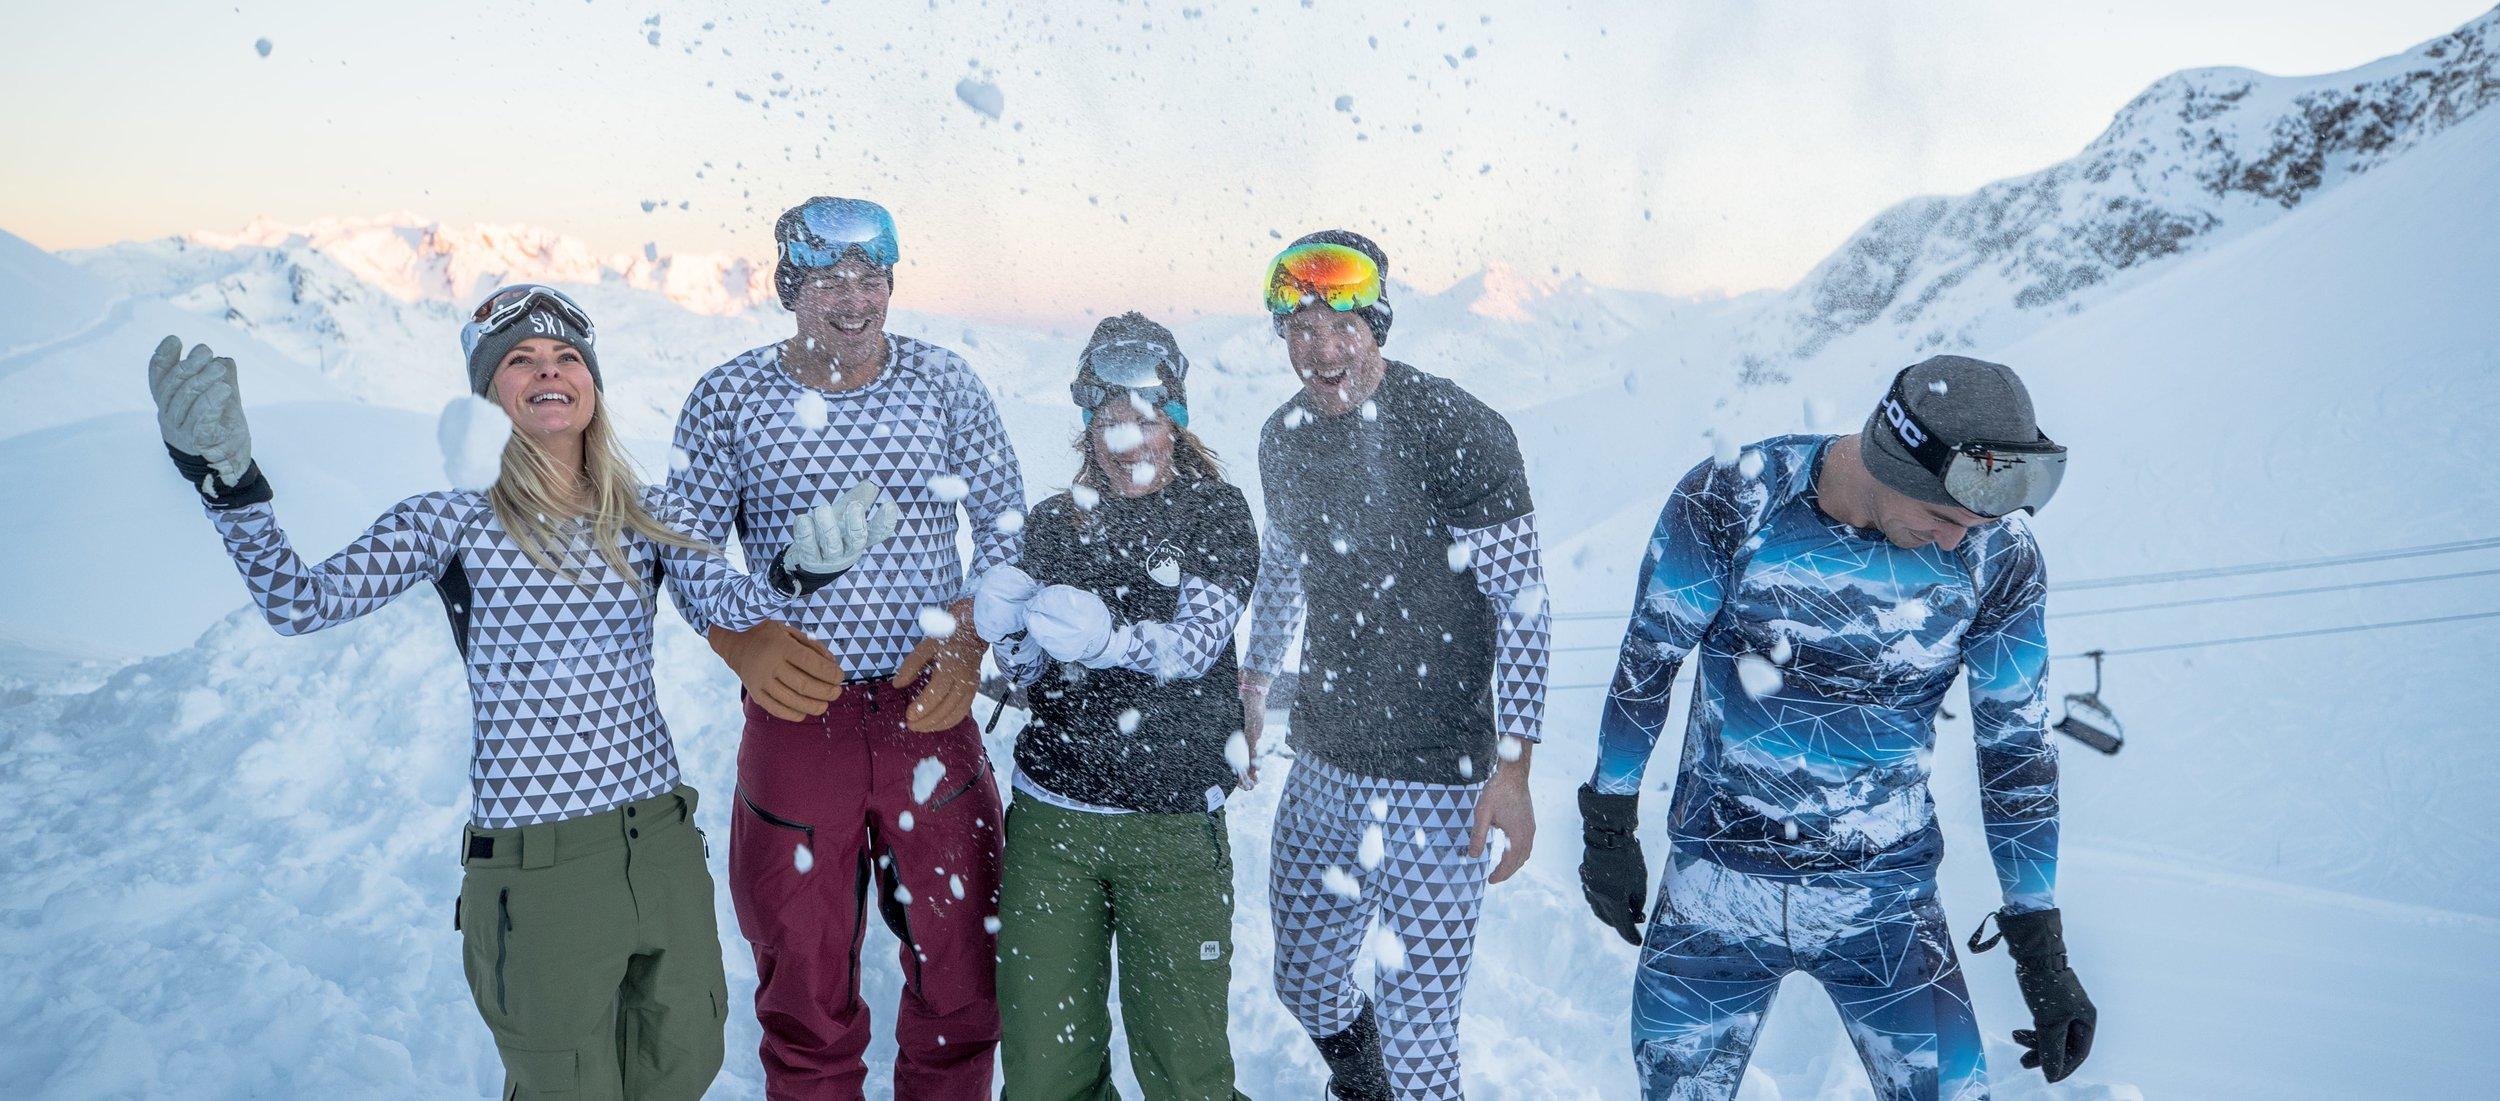 Friski Wear Thermal Baselayers banner image